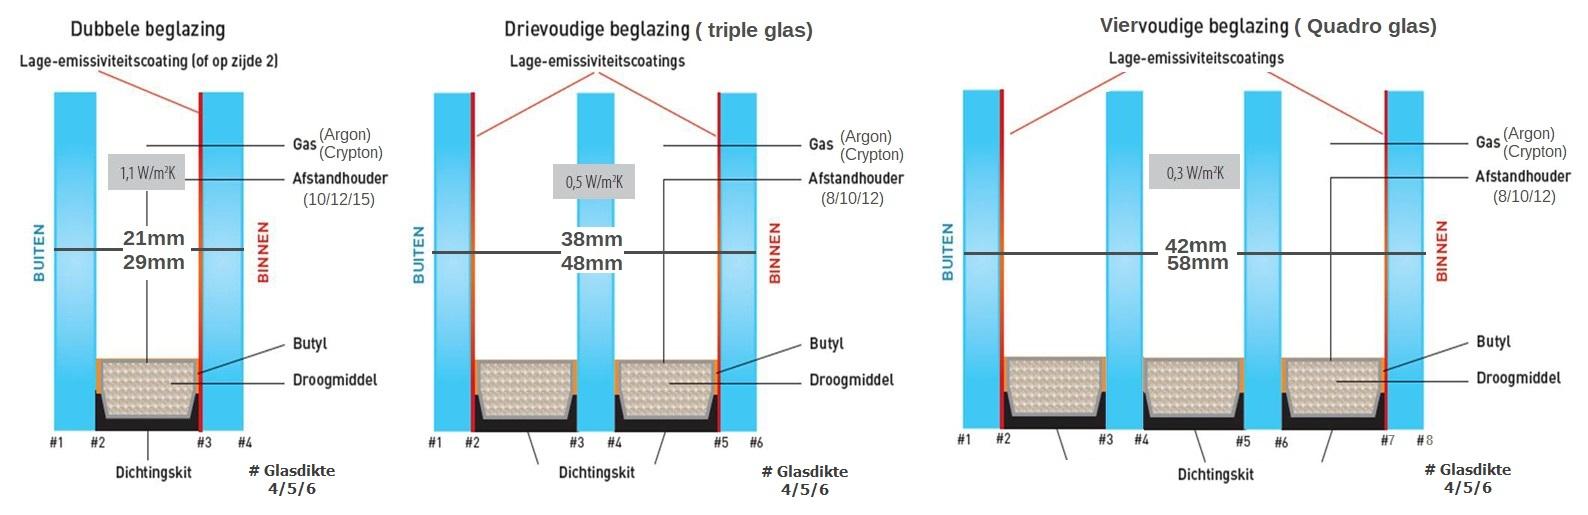 triple glas, quadro glas, dubbel glas, tweevoudig glas, drievoudig glas, viervoudig glas, HR glas, hr++ ,hr+++, hr++++ glas, isolatie glas, drie lagen glas, vierlaagsglas, driedubbel glas, vier dubbelglas,